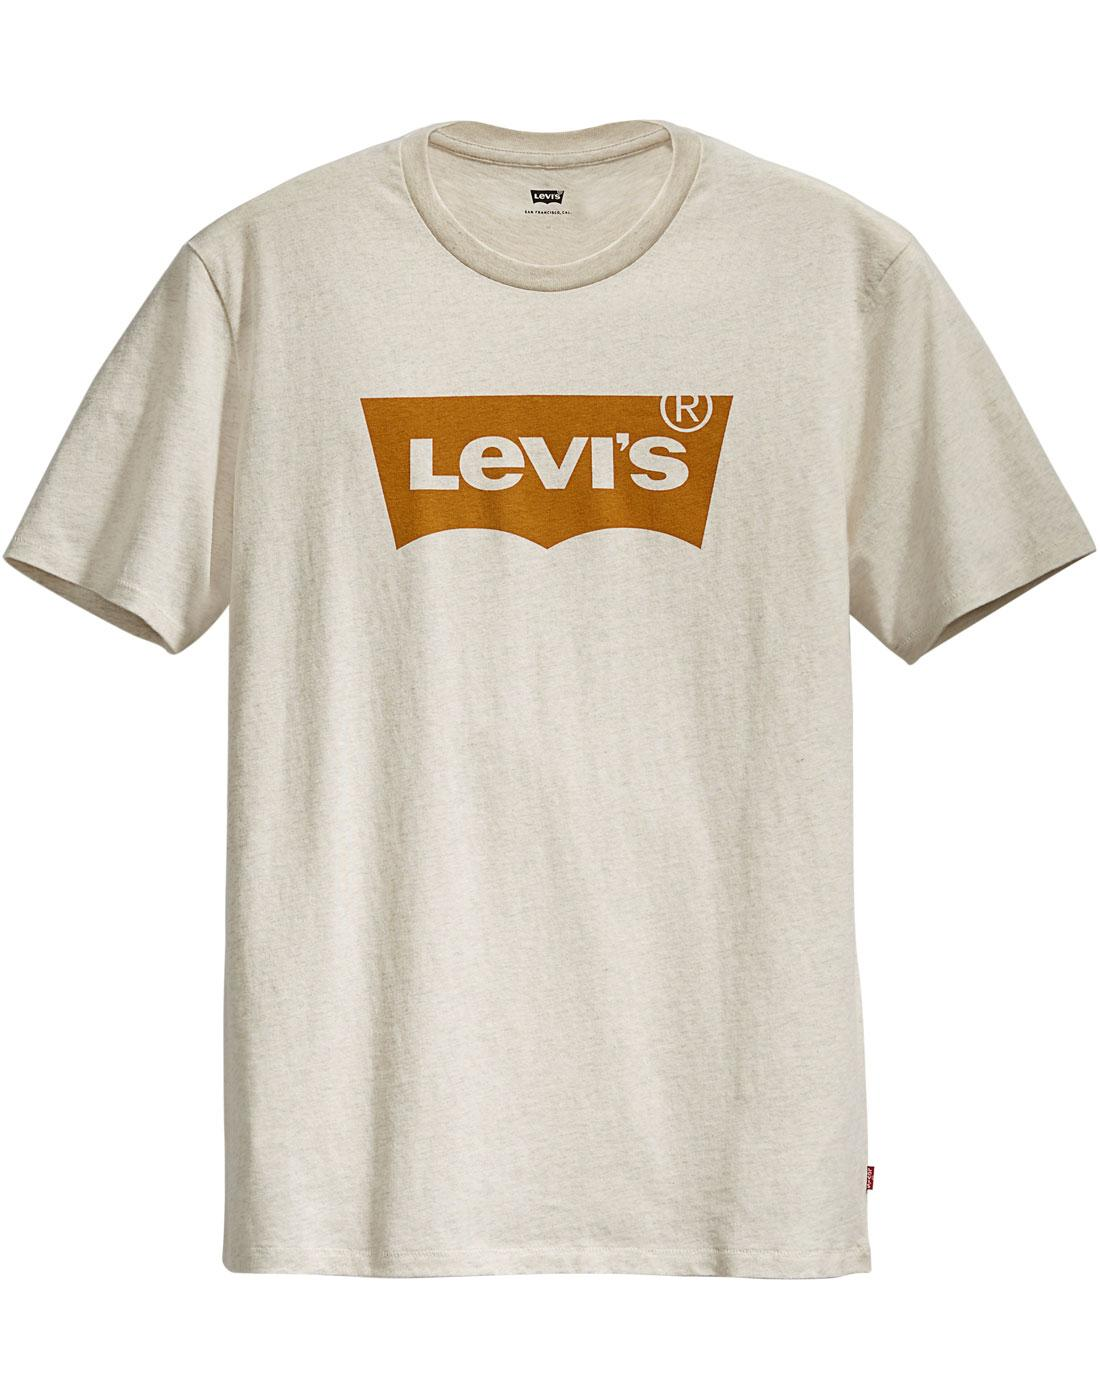 LEVI'S Mens Retro Housemark Batwing Logo Tee CHALK